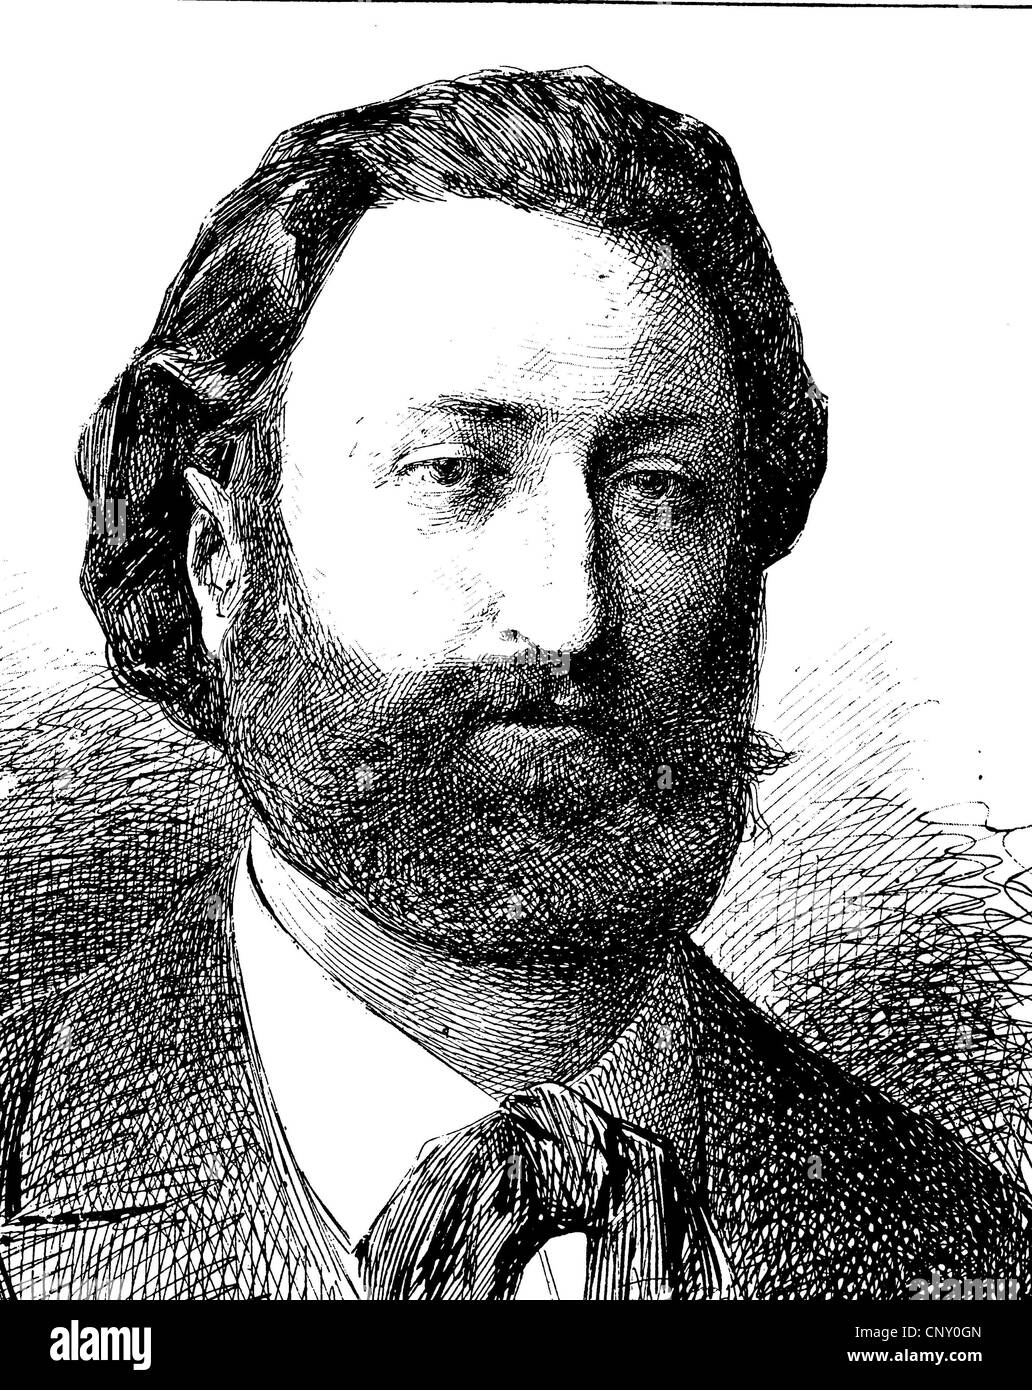 Lambert Joseph Emmanuel Servais, 1811-1890, was a Luxembourgian politician and writer. - Stock Image